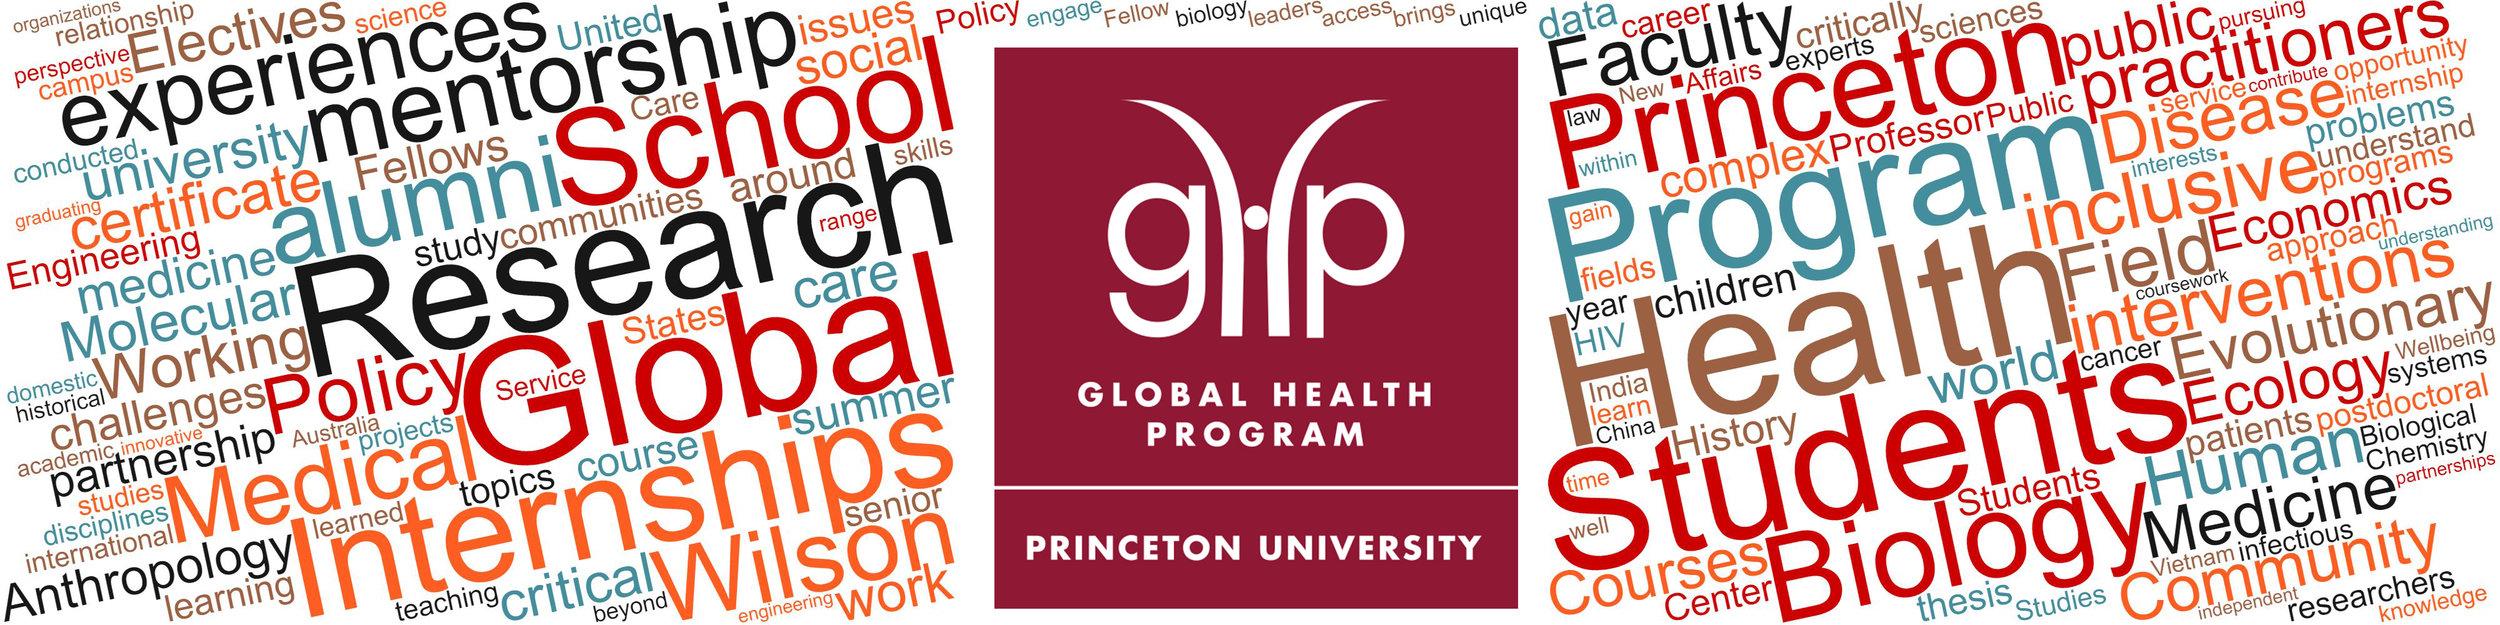 The Global Health Program, Princeton University